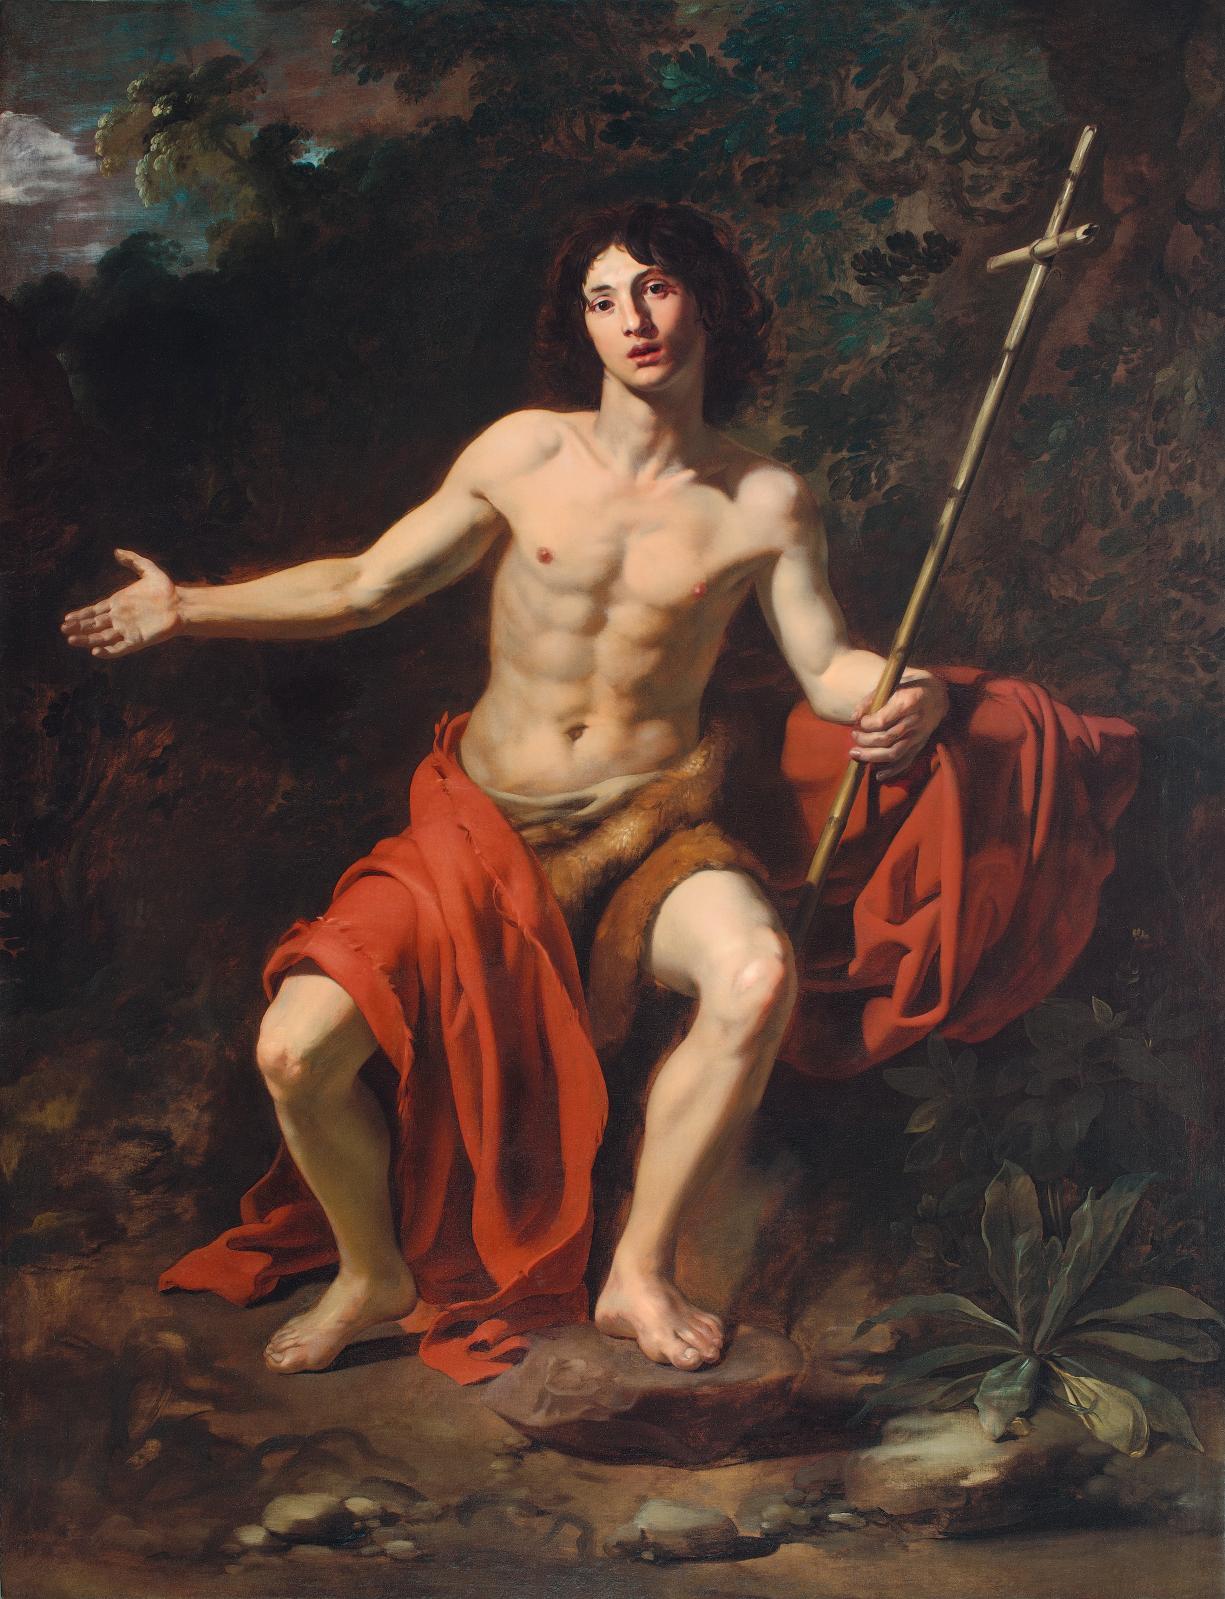 Nicolas Régnier, Saint Jean-Baptiste, huile sur toile, non exposé. Rome, Fondazione di Roma